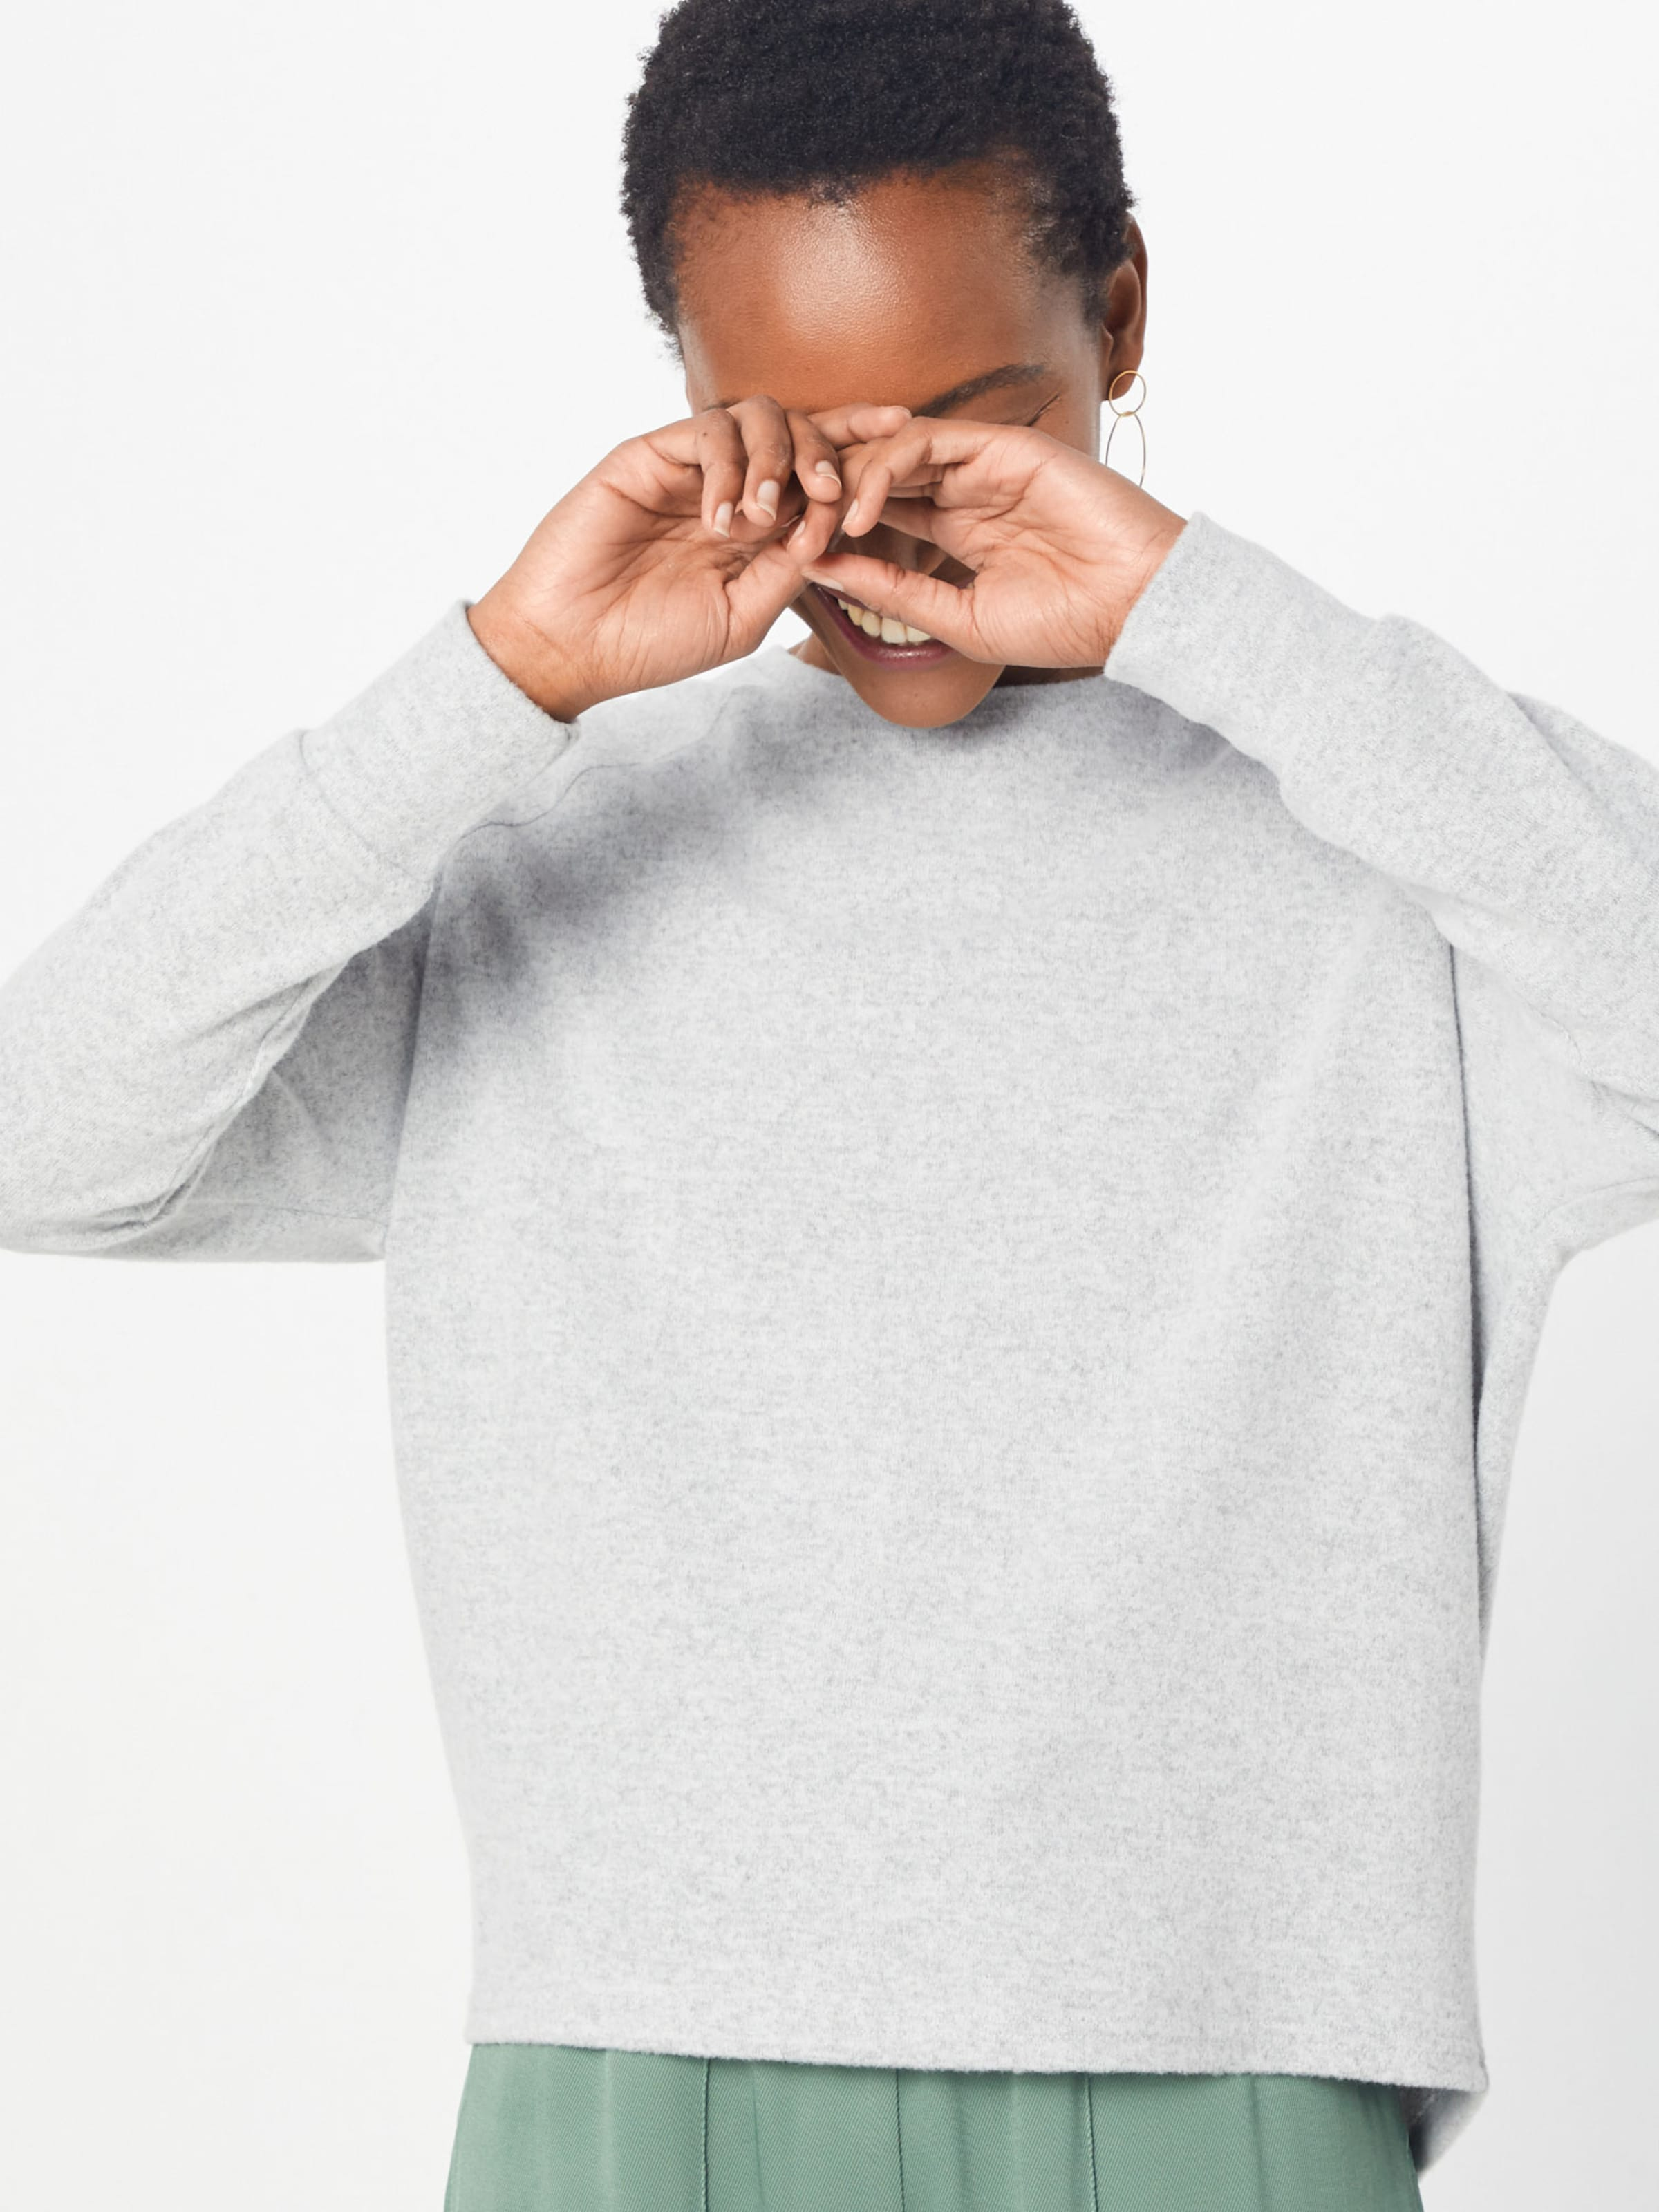 Top' shirt Noisy Gris Clair Sweat L En May 'nmcity s Zip dBoxeWQErC